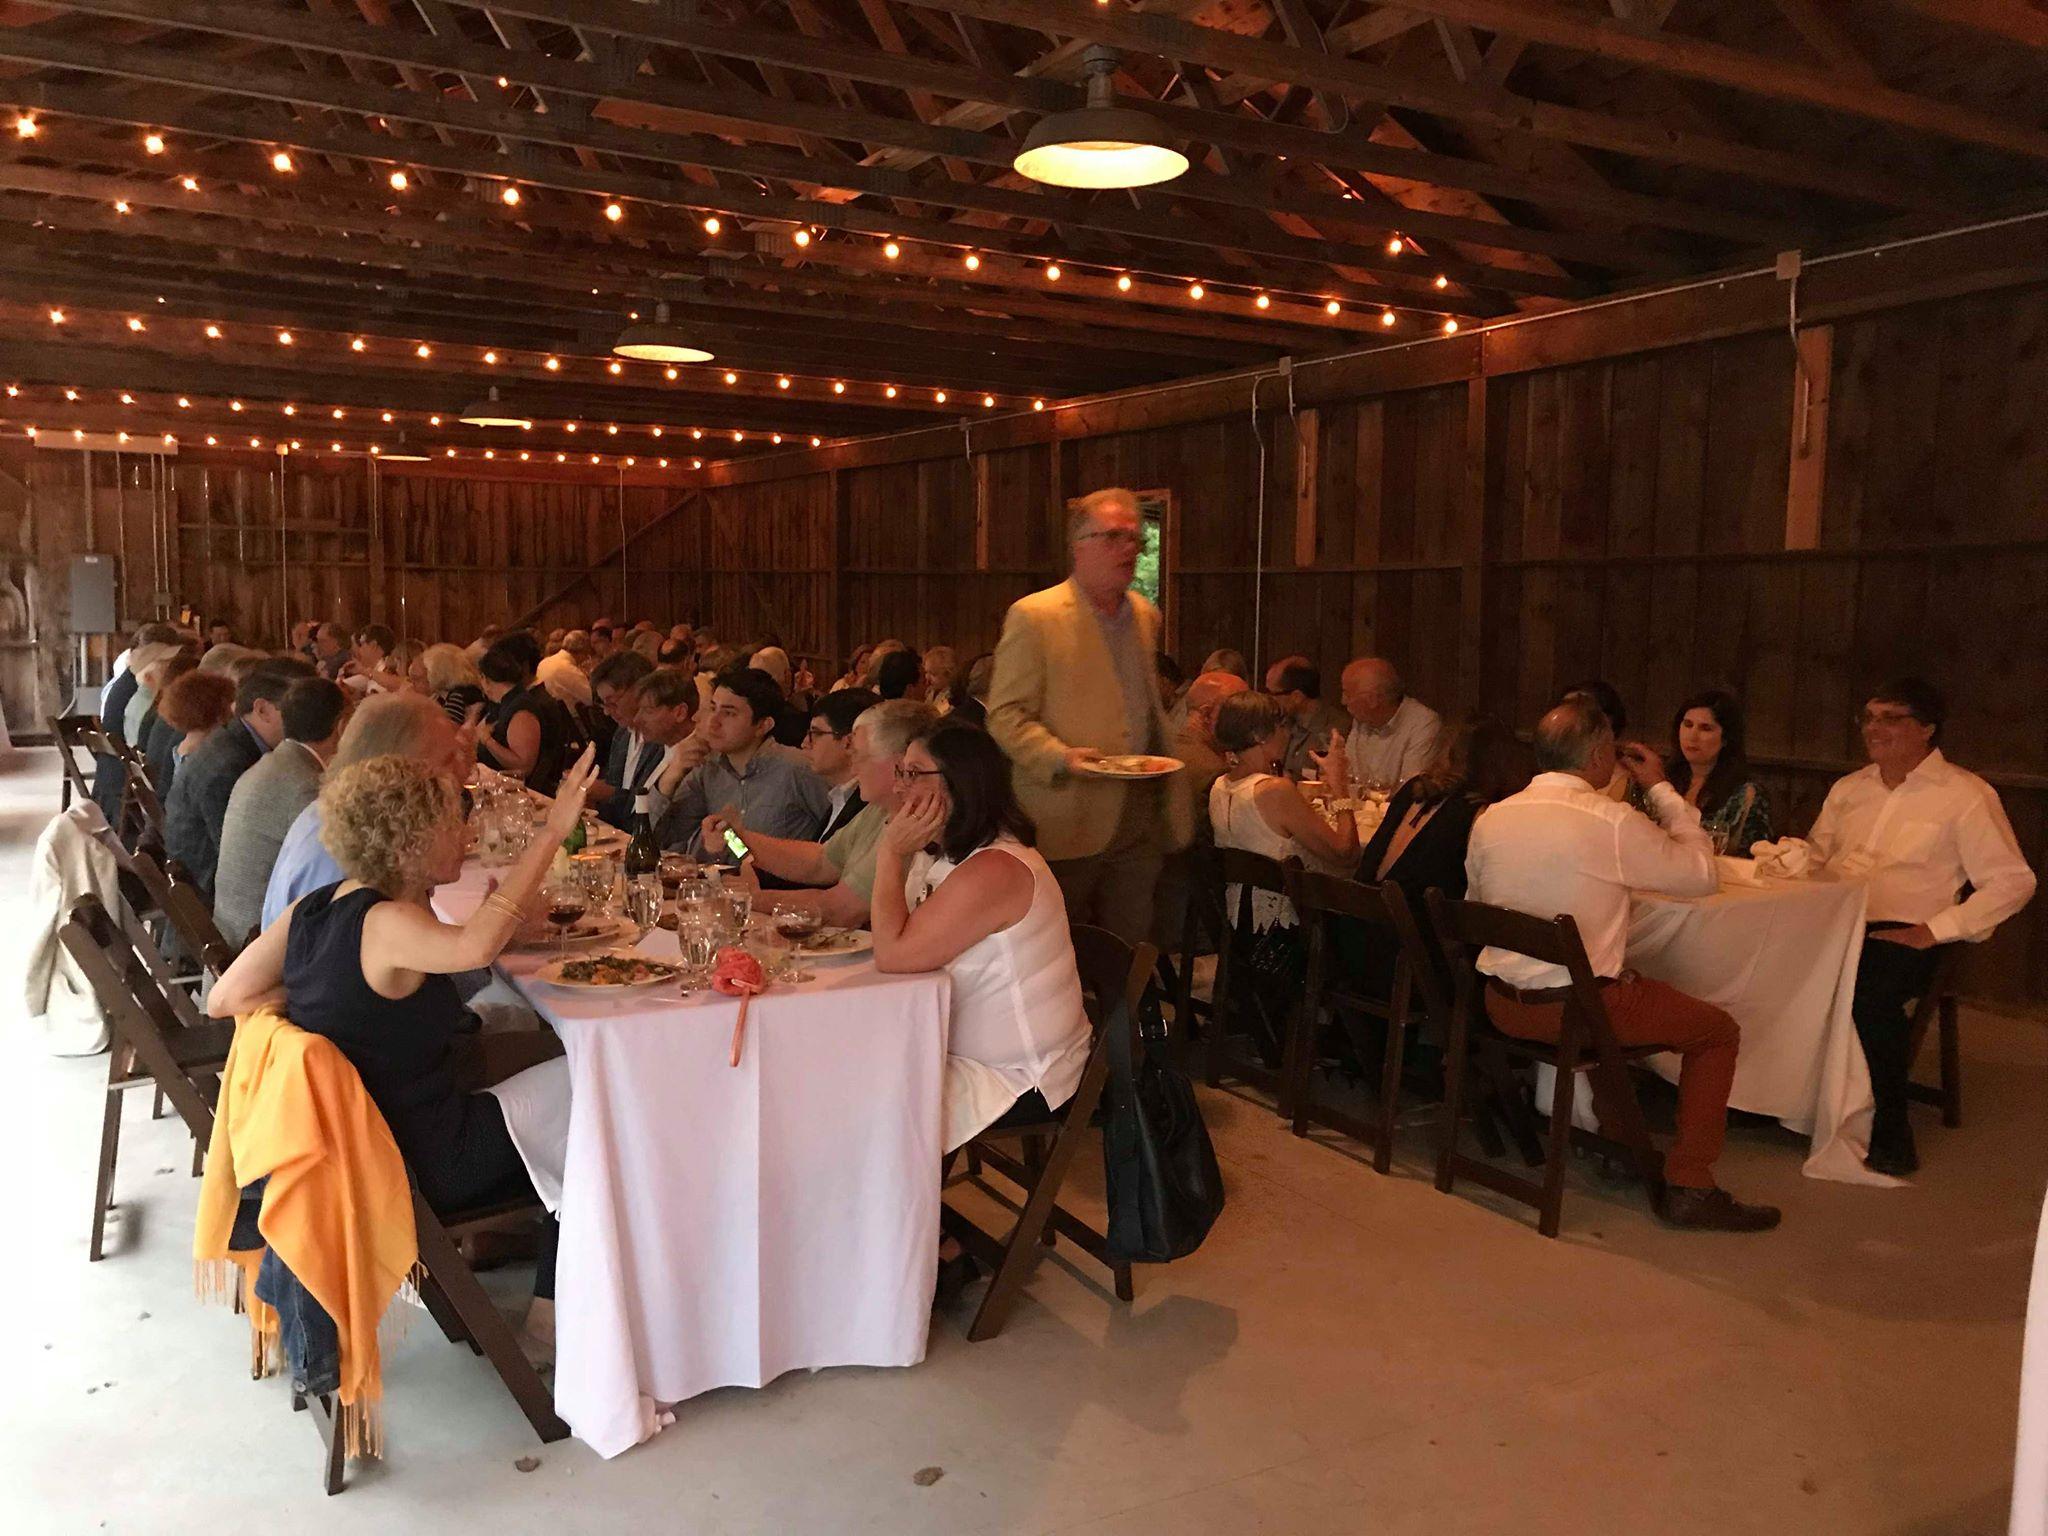 Dinner in the pole barn -Richard Seidlitz